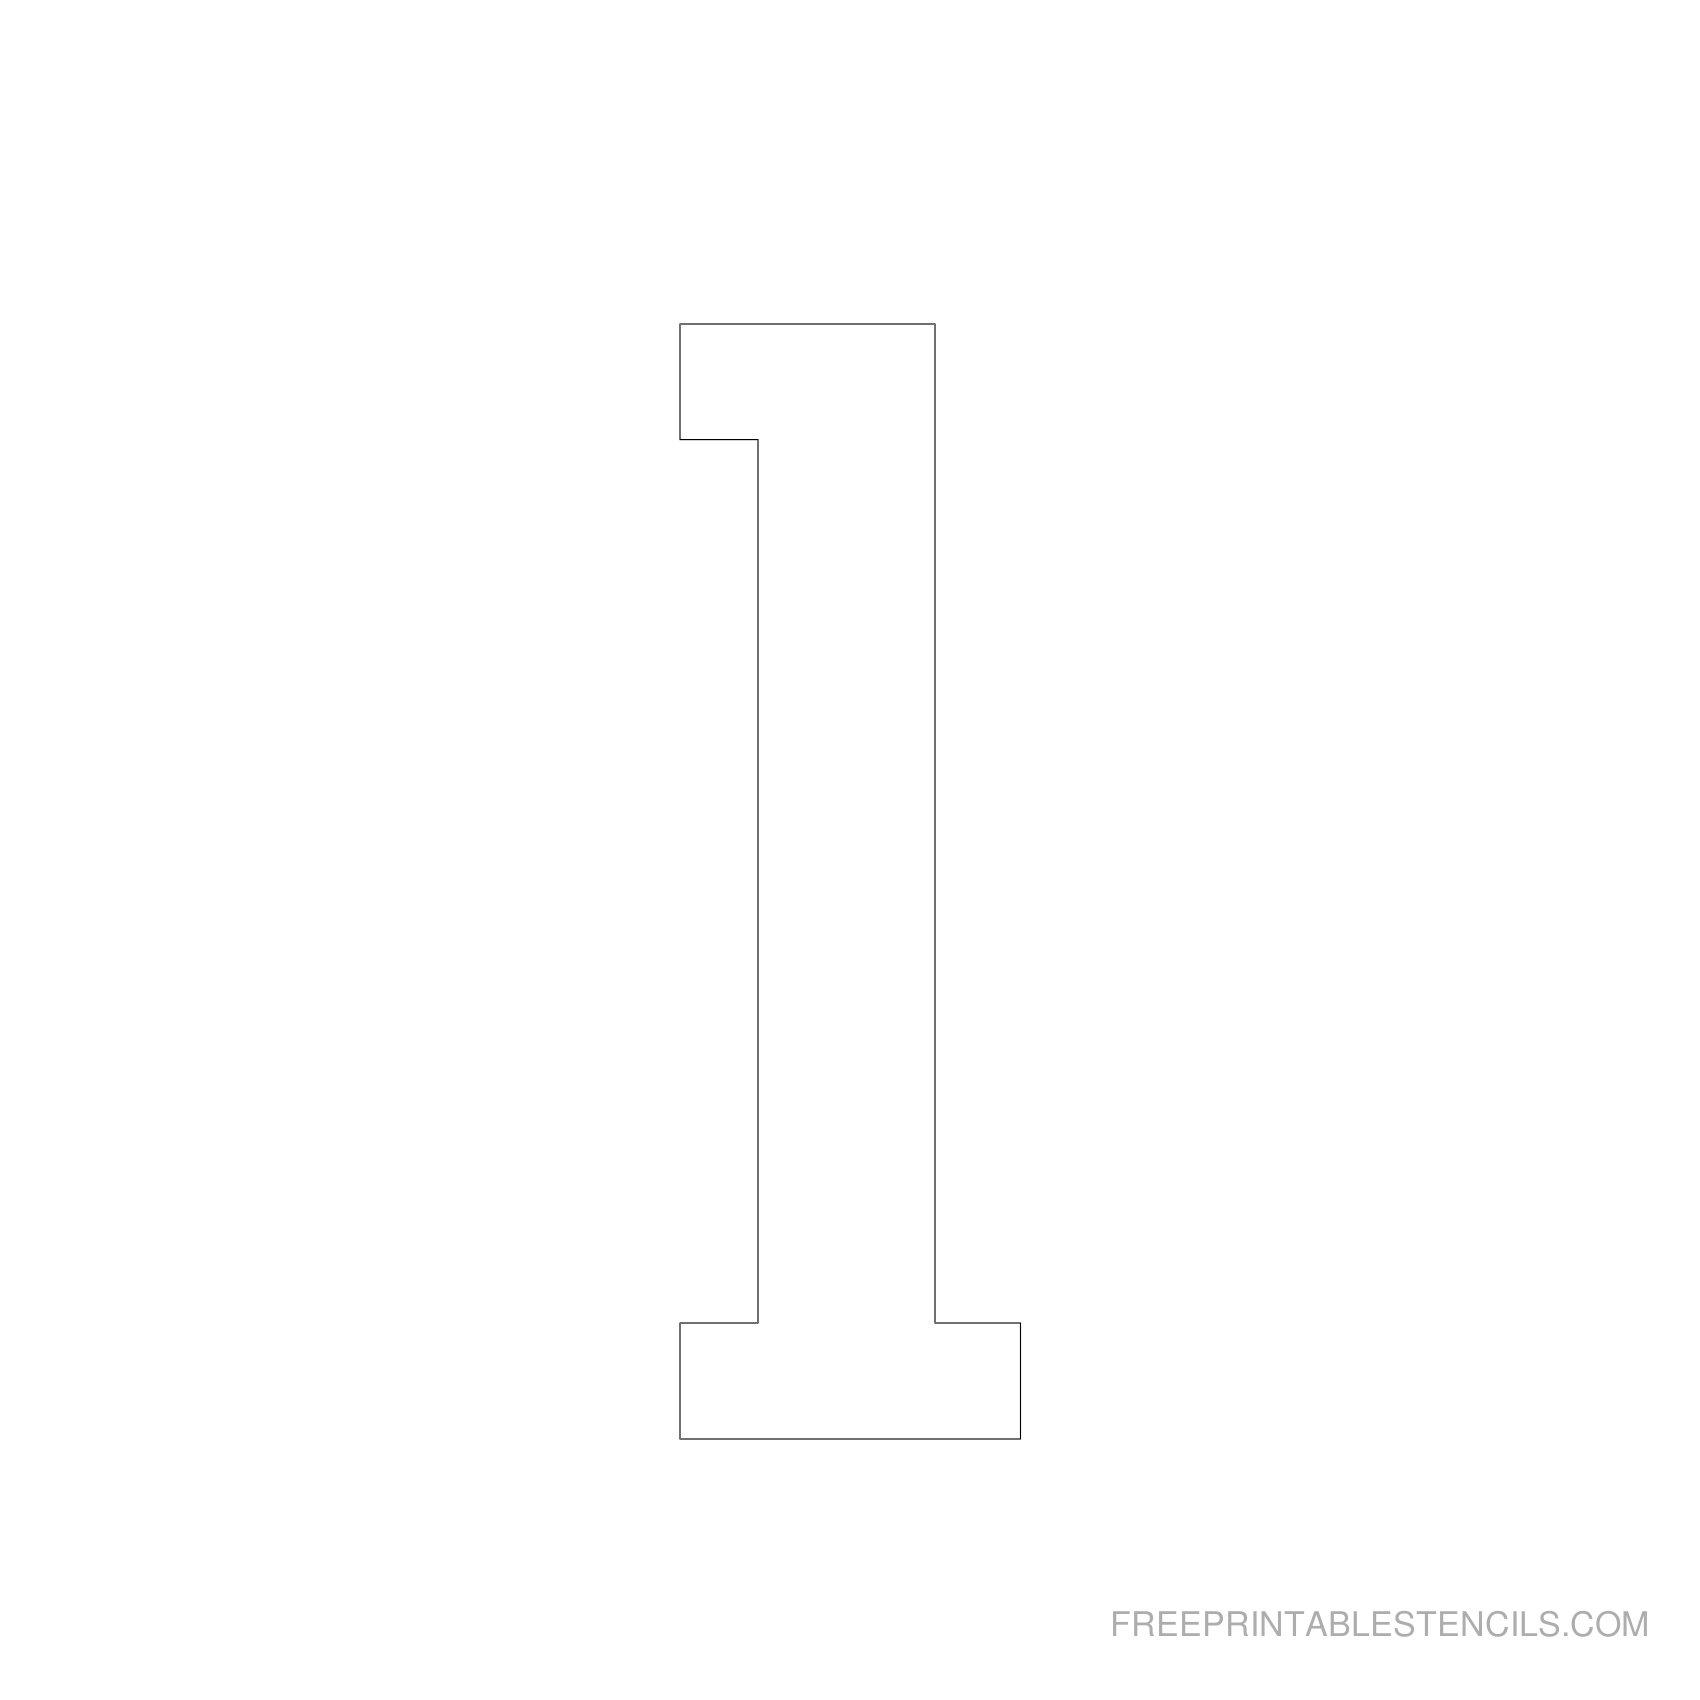 Printable 5 Inch Number Stencils 1-10 | Free Printable Stencils - Free Printable 10 Inch Letter Stencils